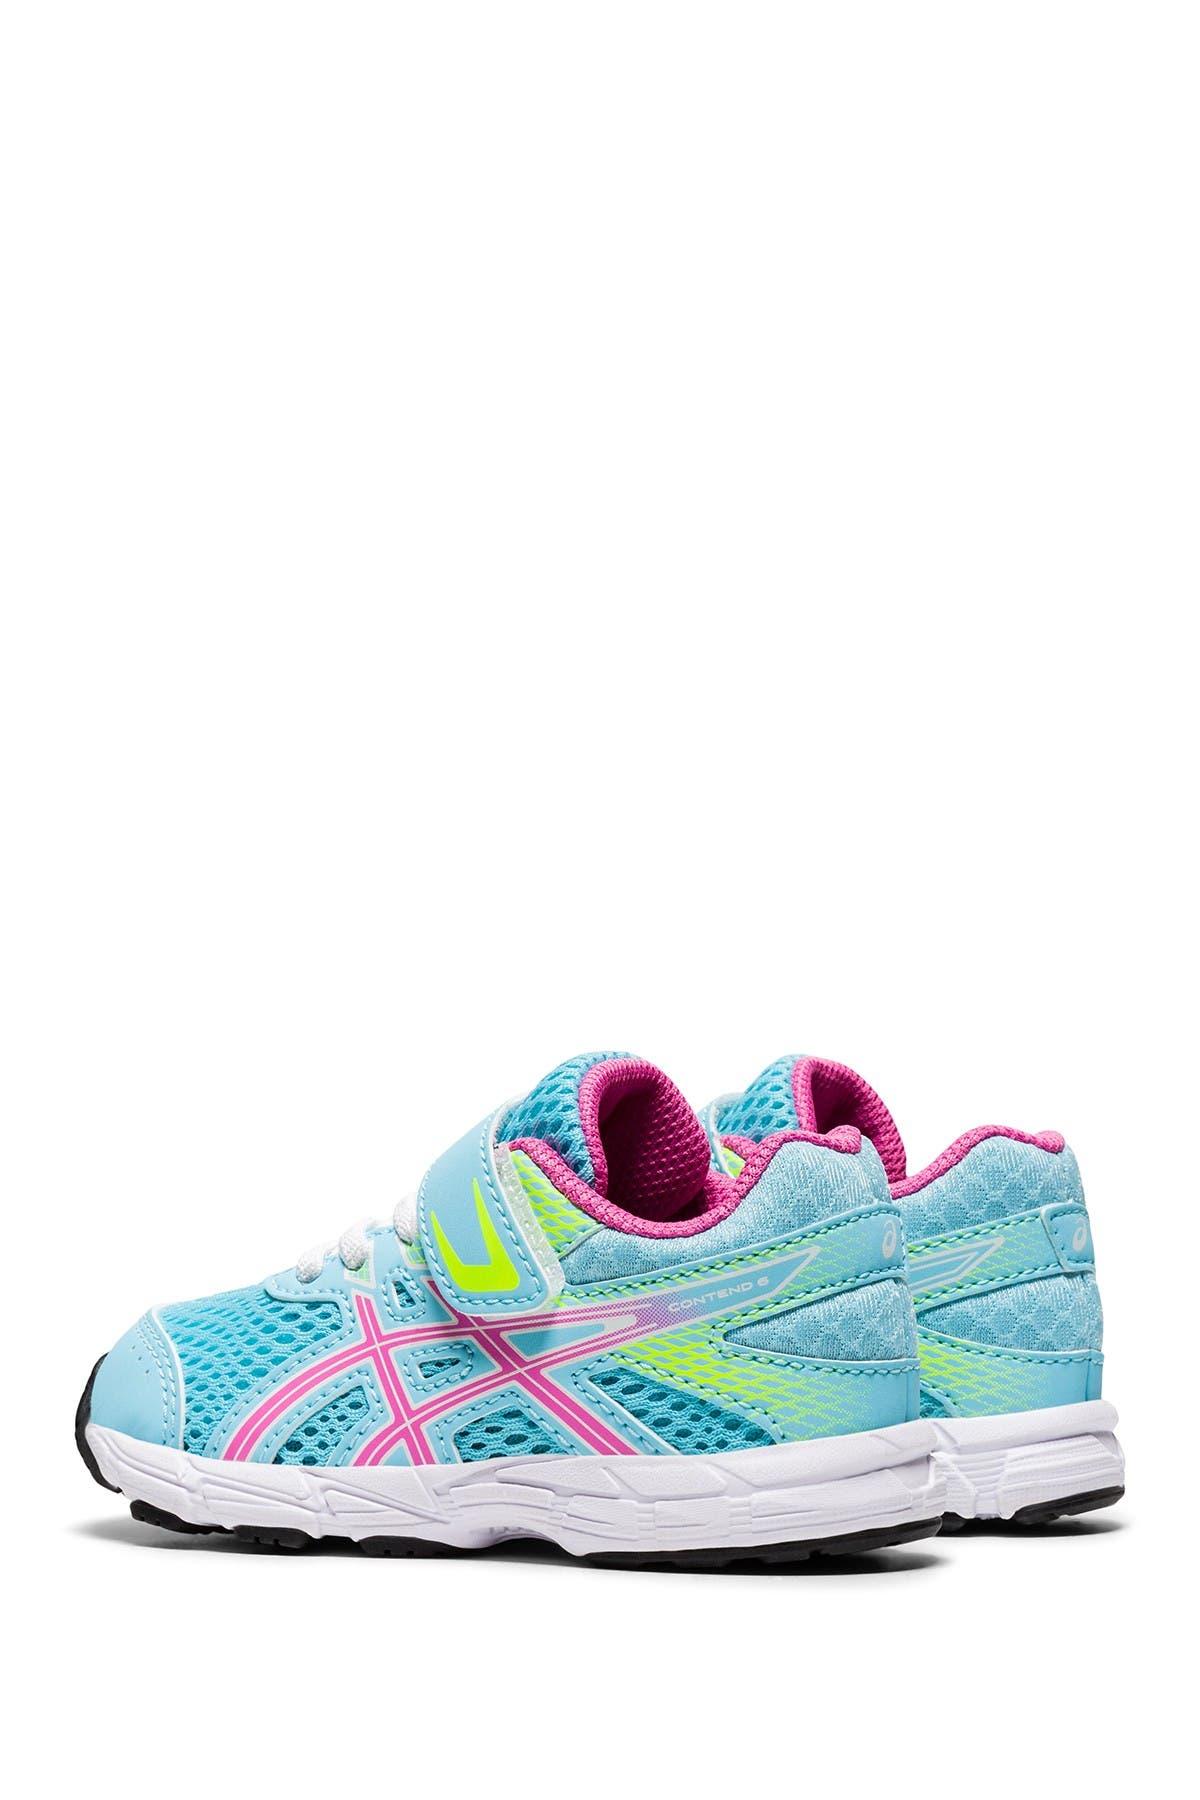 ASICS GEL-Contend 6 Sneaker